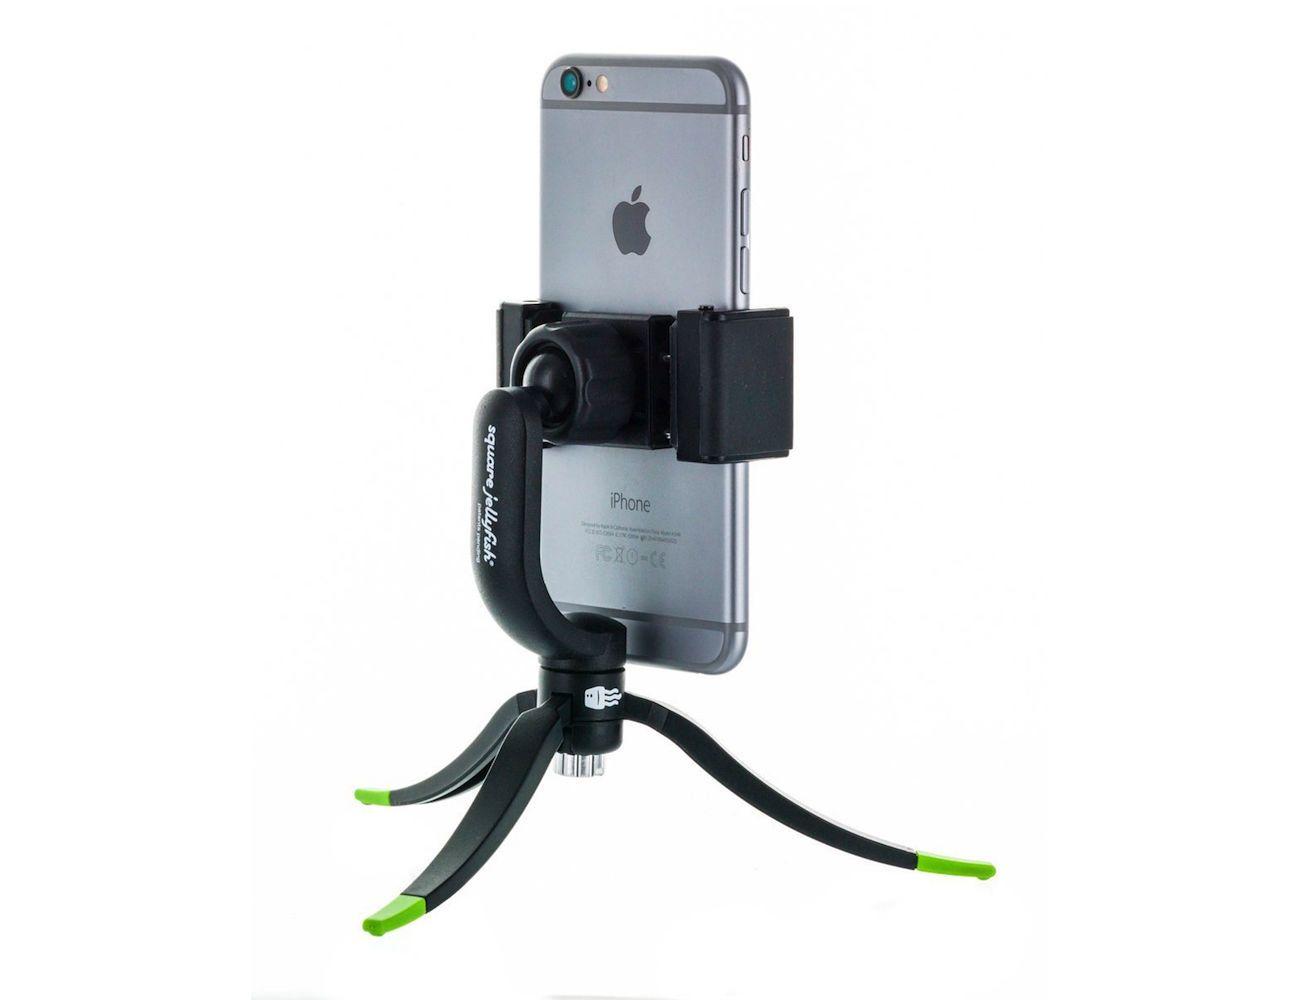 Jelly Grip Smartphone Tripod